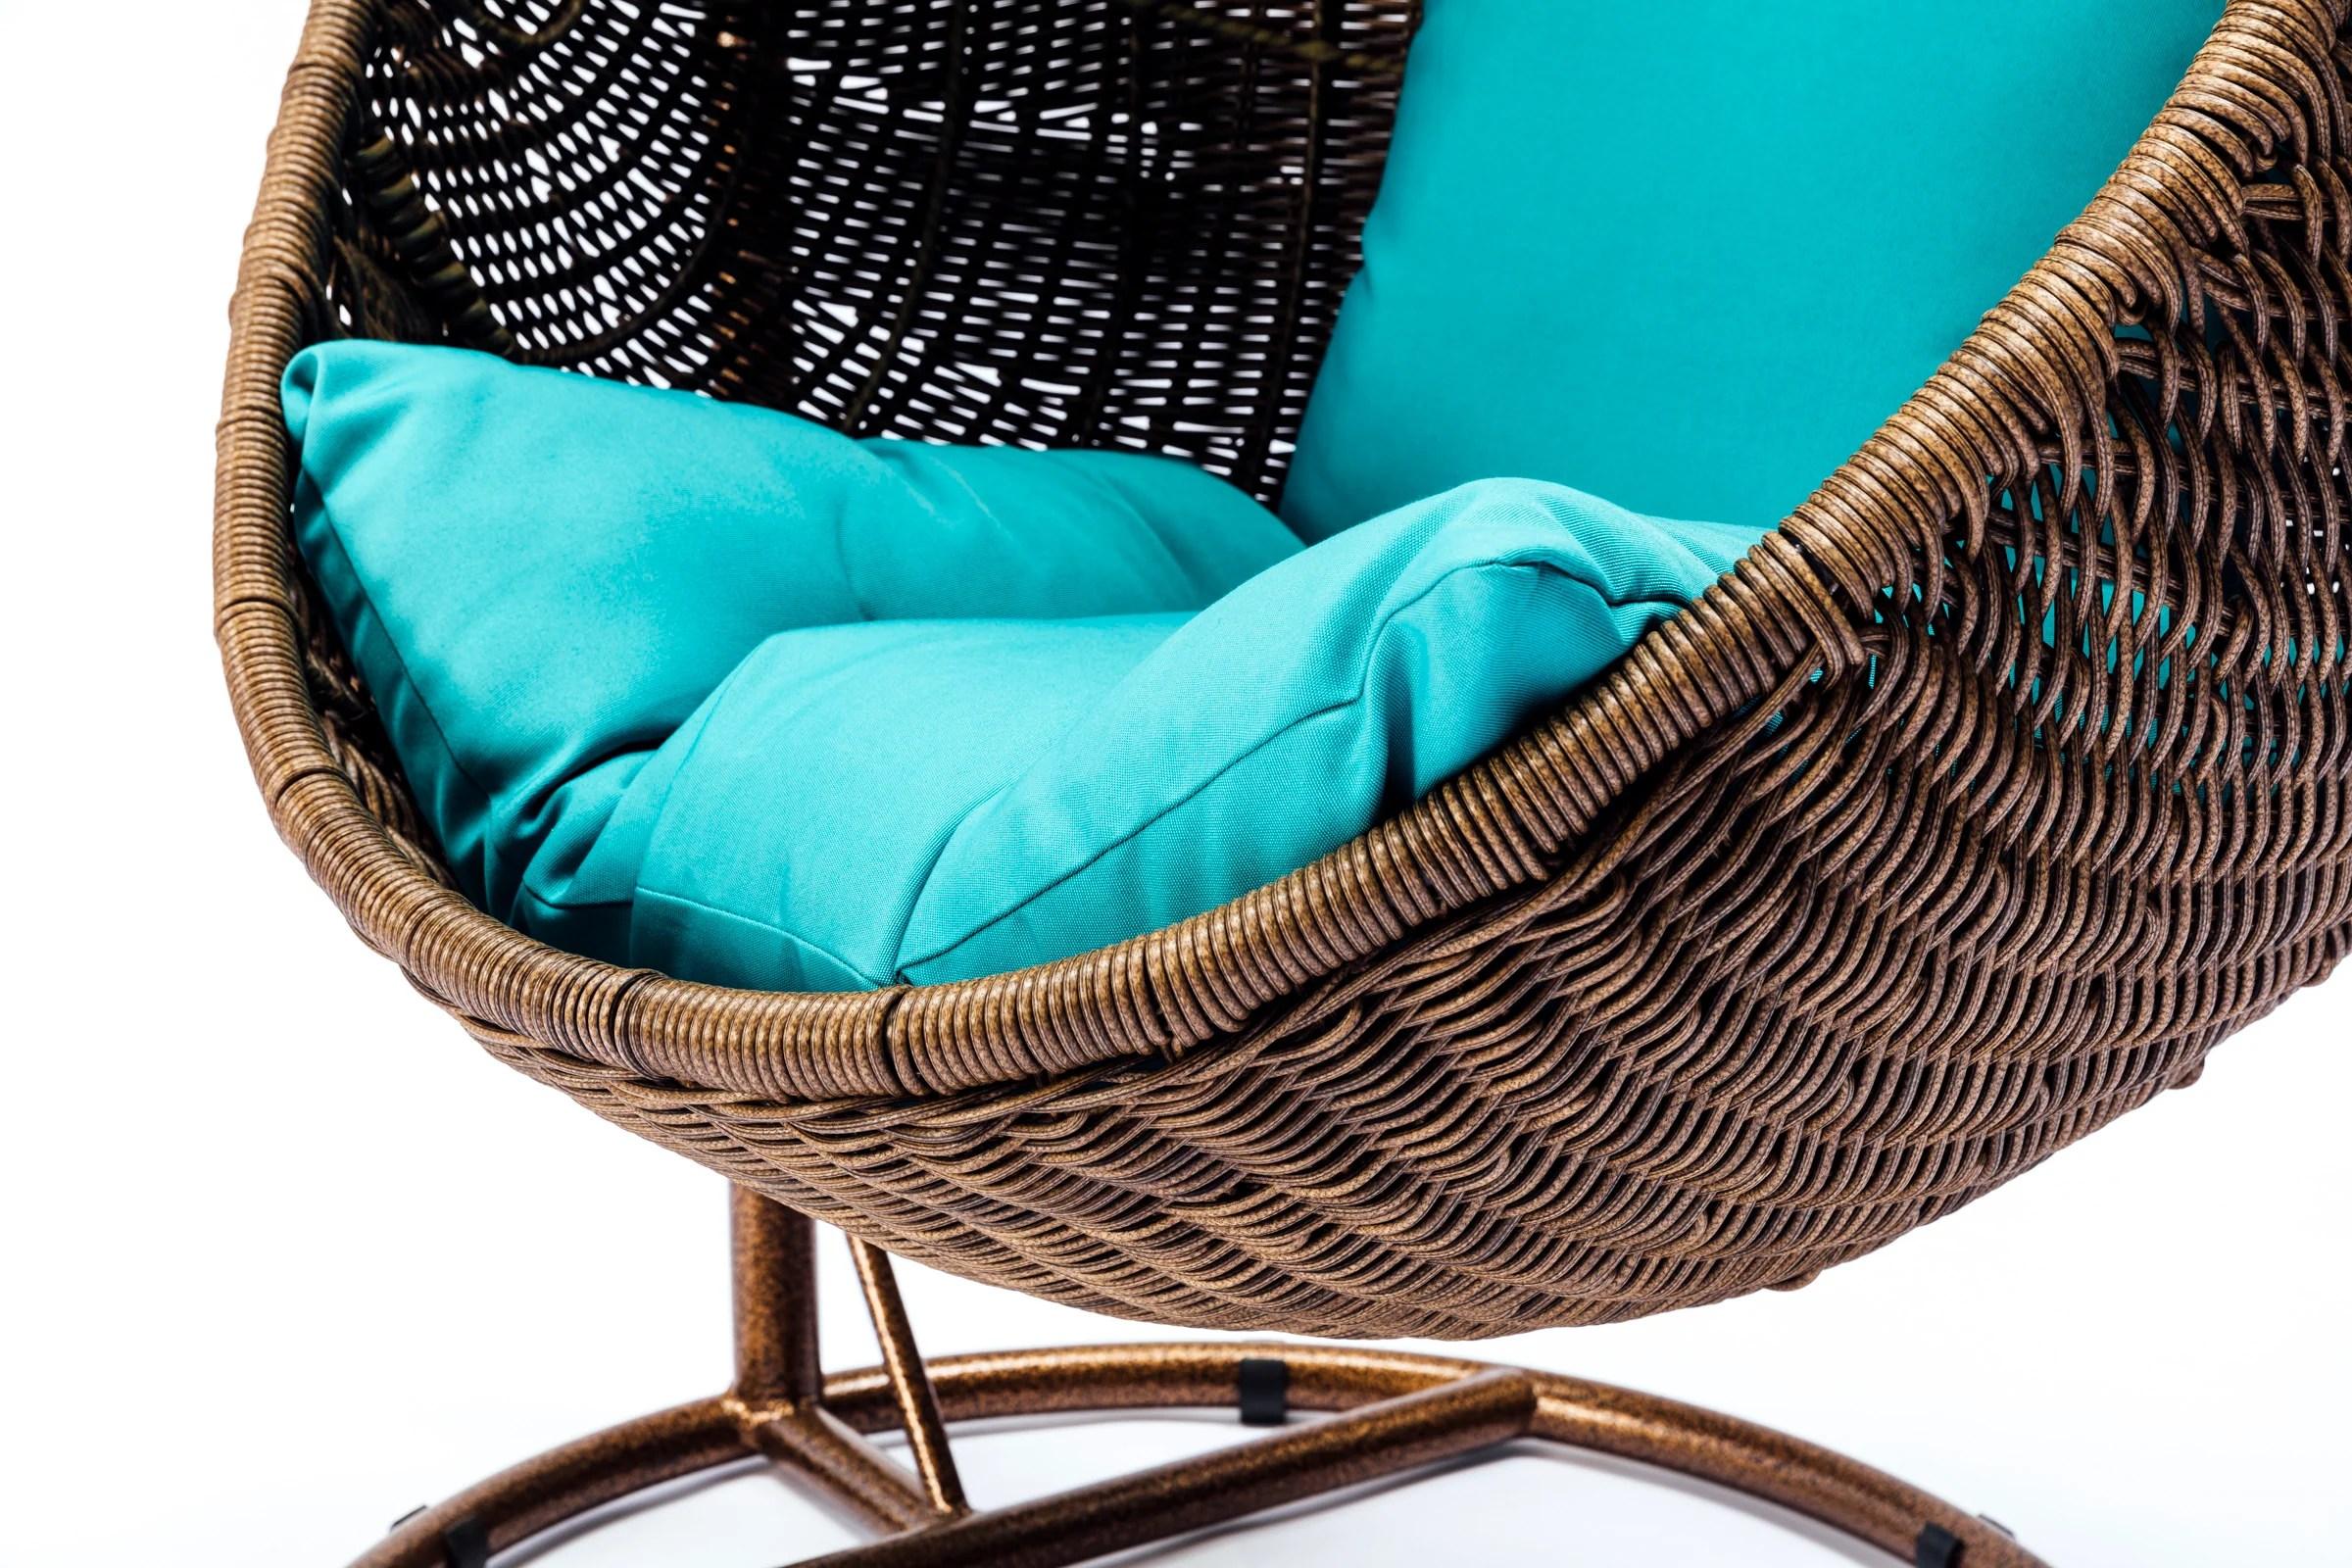 Ansan Outdoor Furniture - Wicker Egg Swing Chair